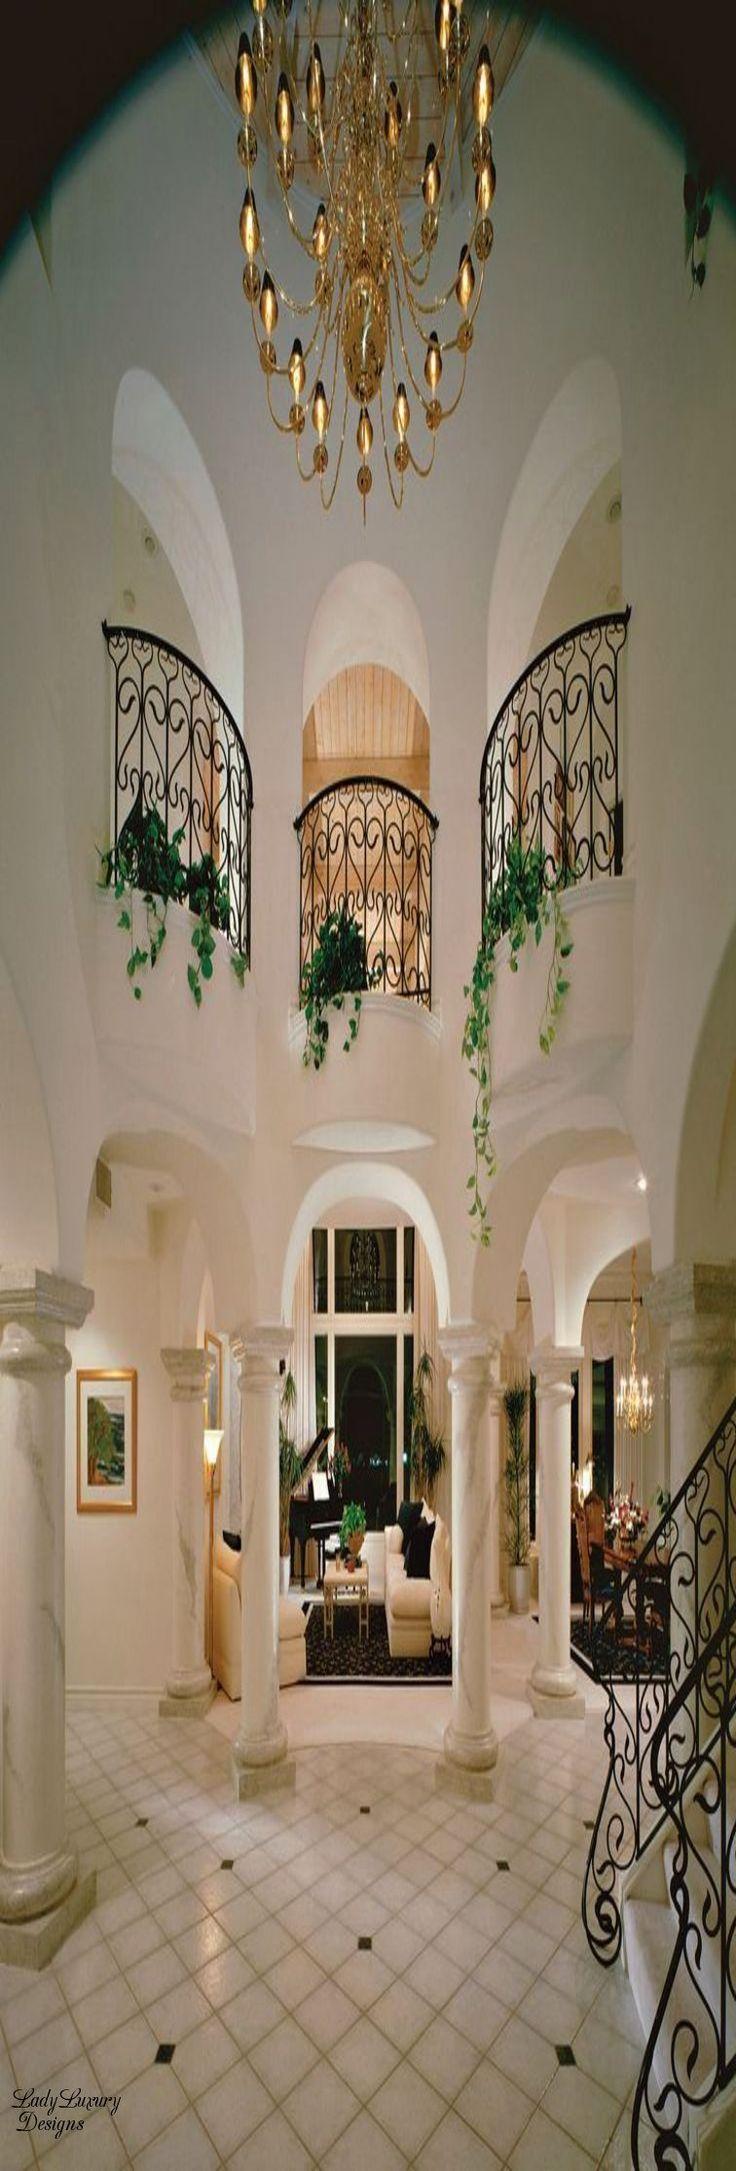 House Foyer Uk : Million dollar interiors ladyluxurydesigns dream homes